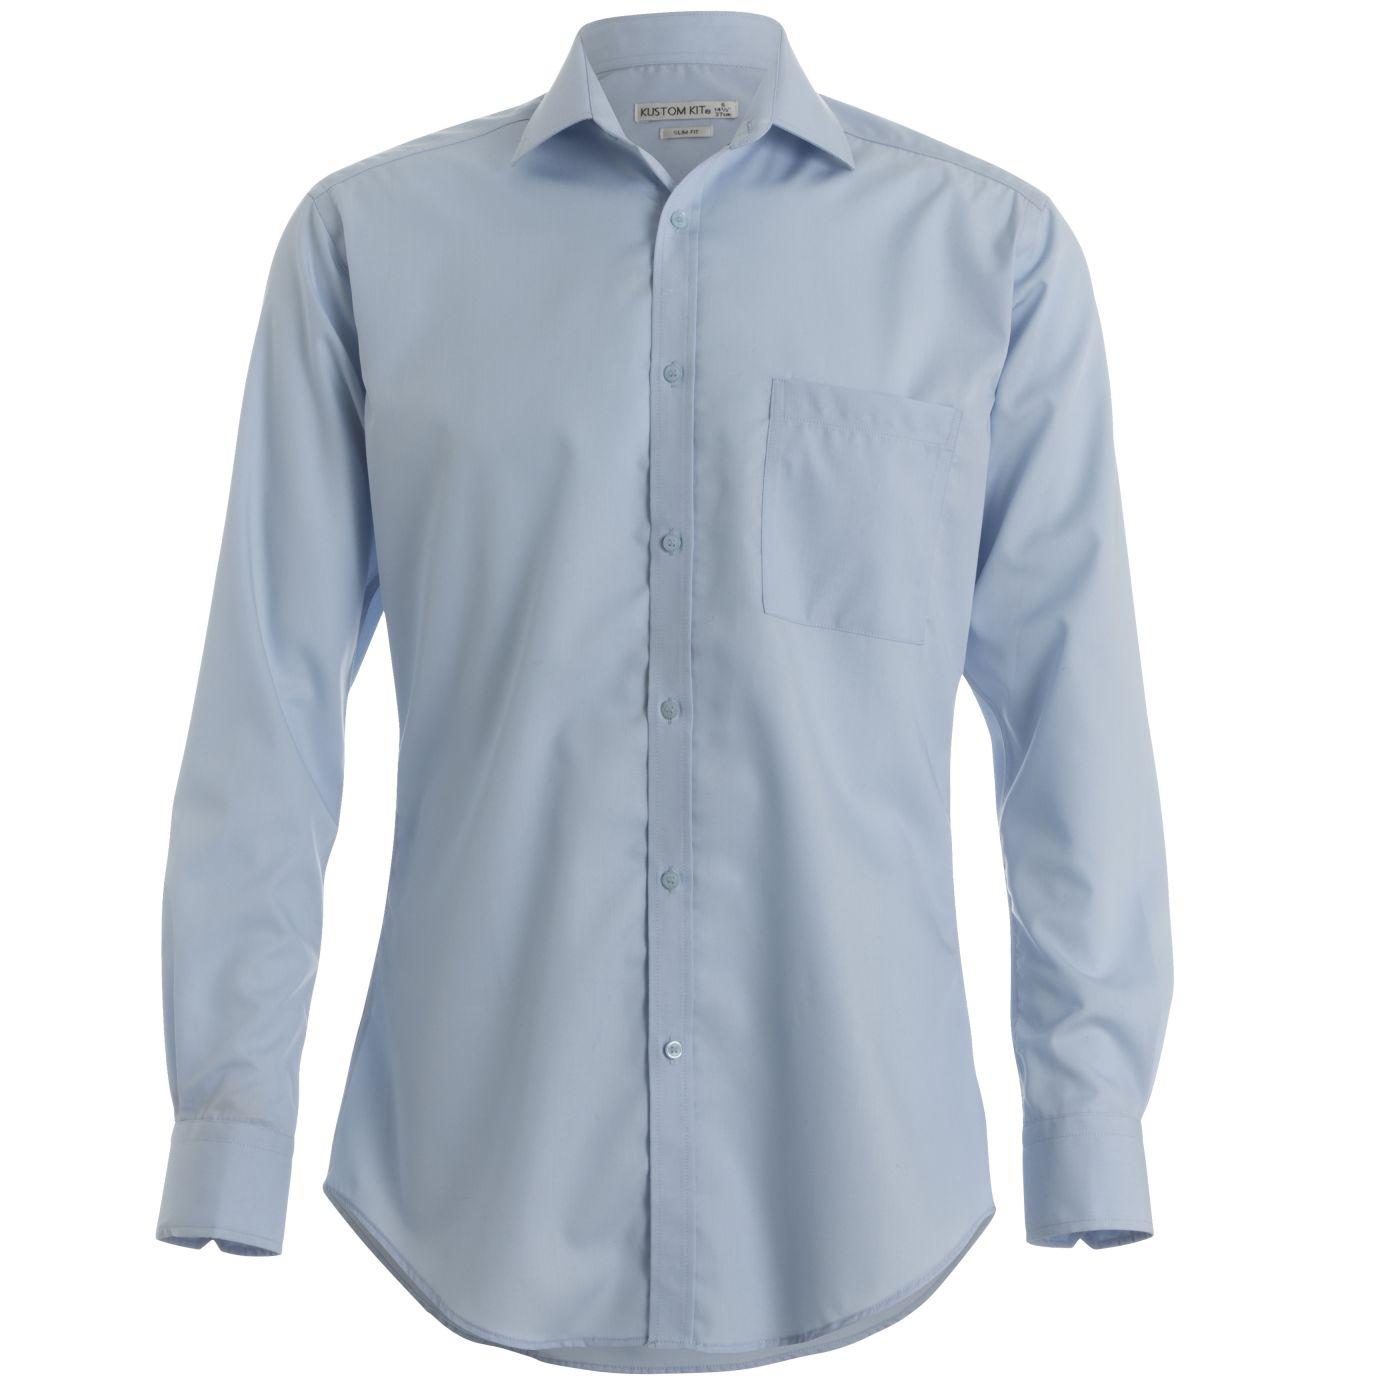 Kustom kit men 39 s premium non iron slim fit long sleeved for Slim fit non iron shirts